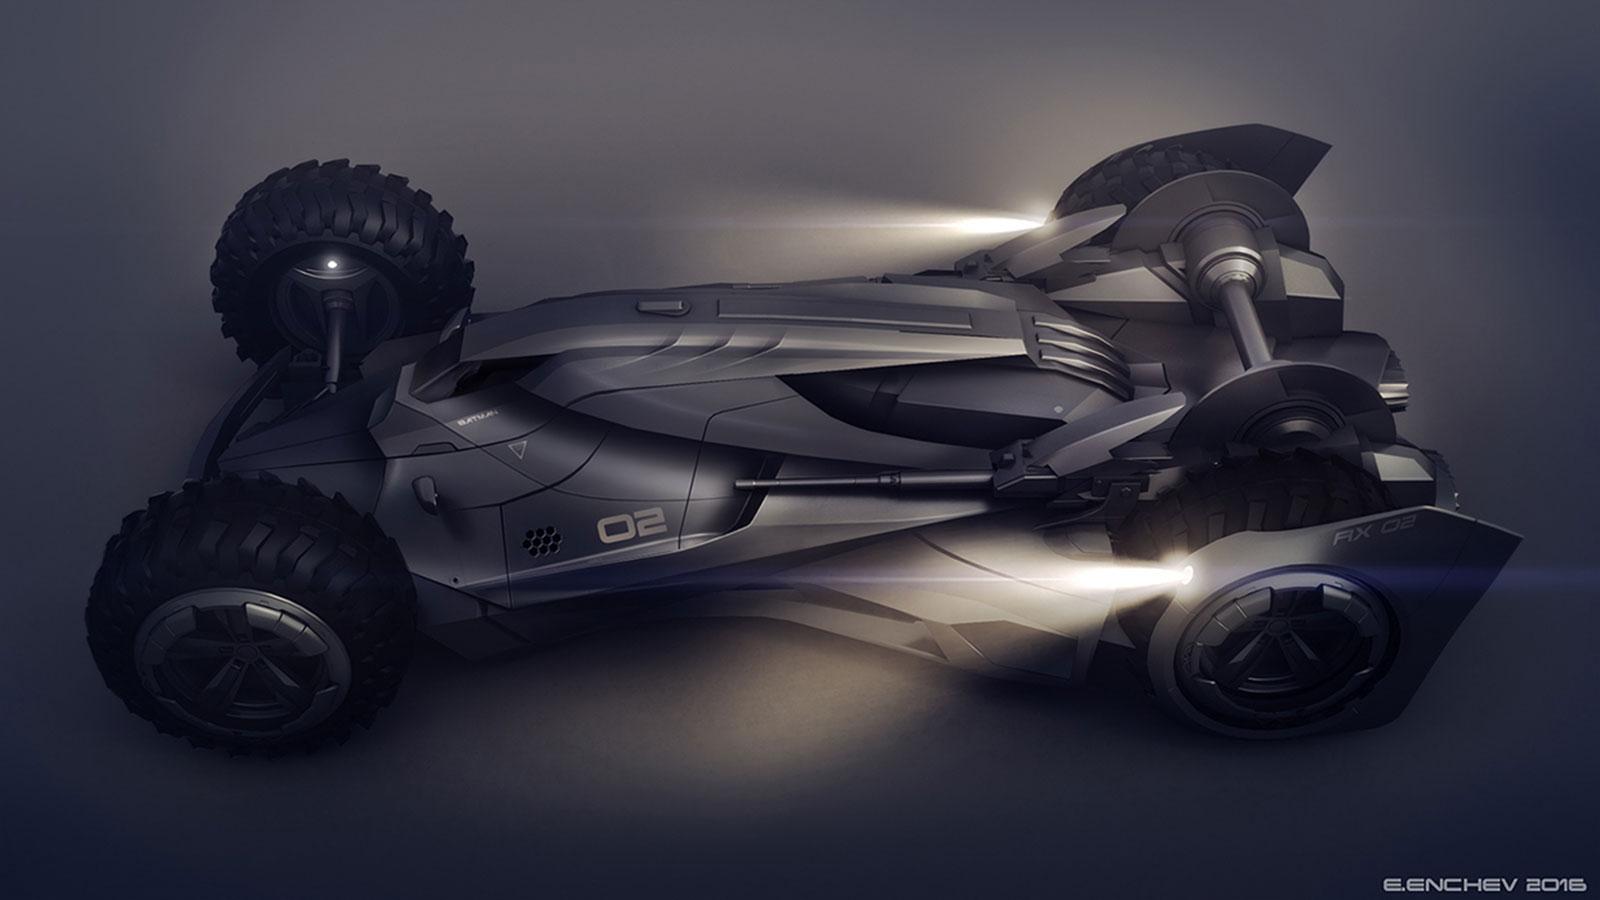 Batmobile-Concept-By-Encho-Enchev-4